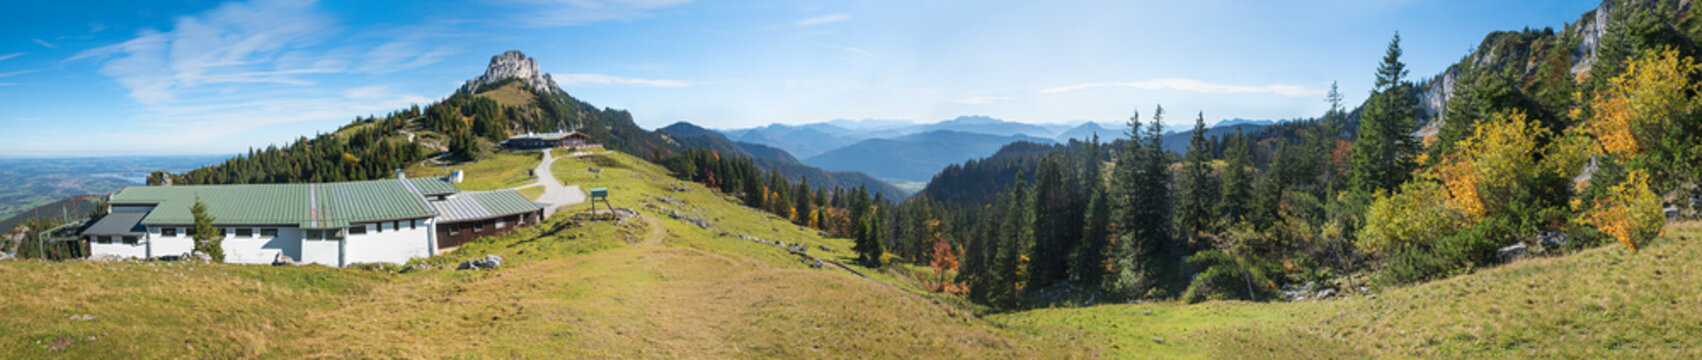 upper station of Kampenwand mountain, alpine panorama Chiemgau alps, bavaria